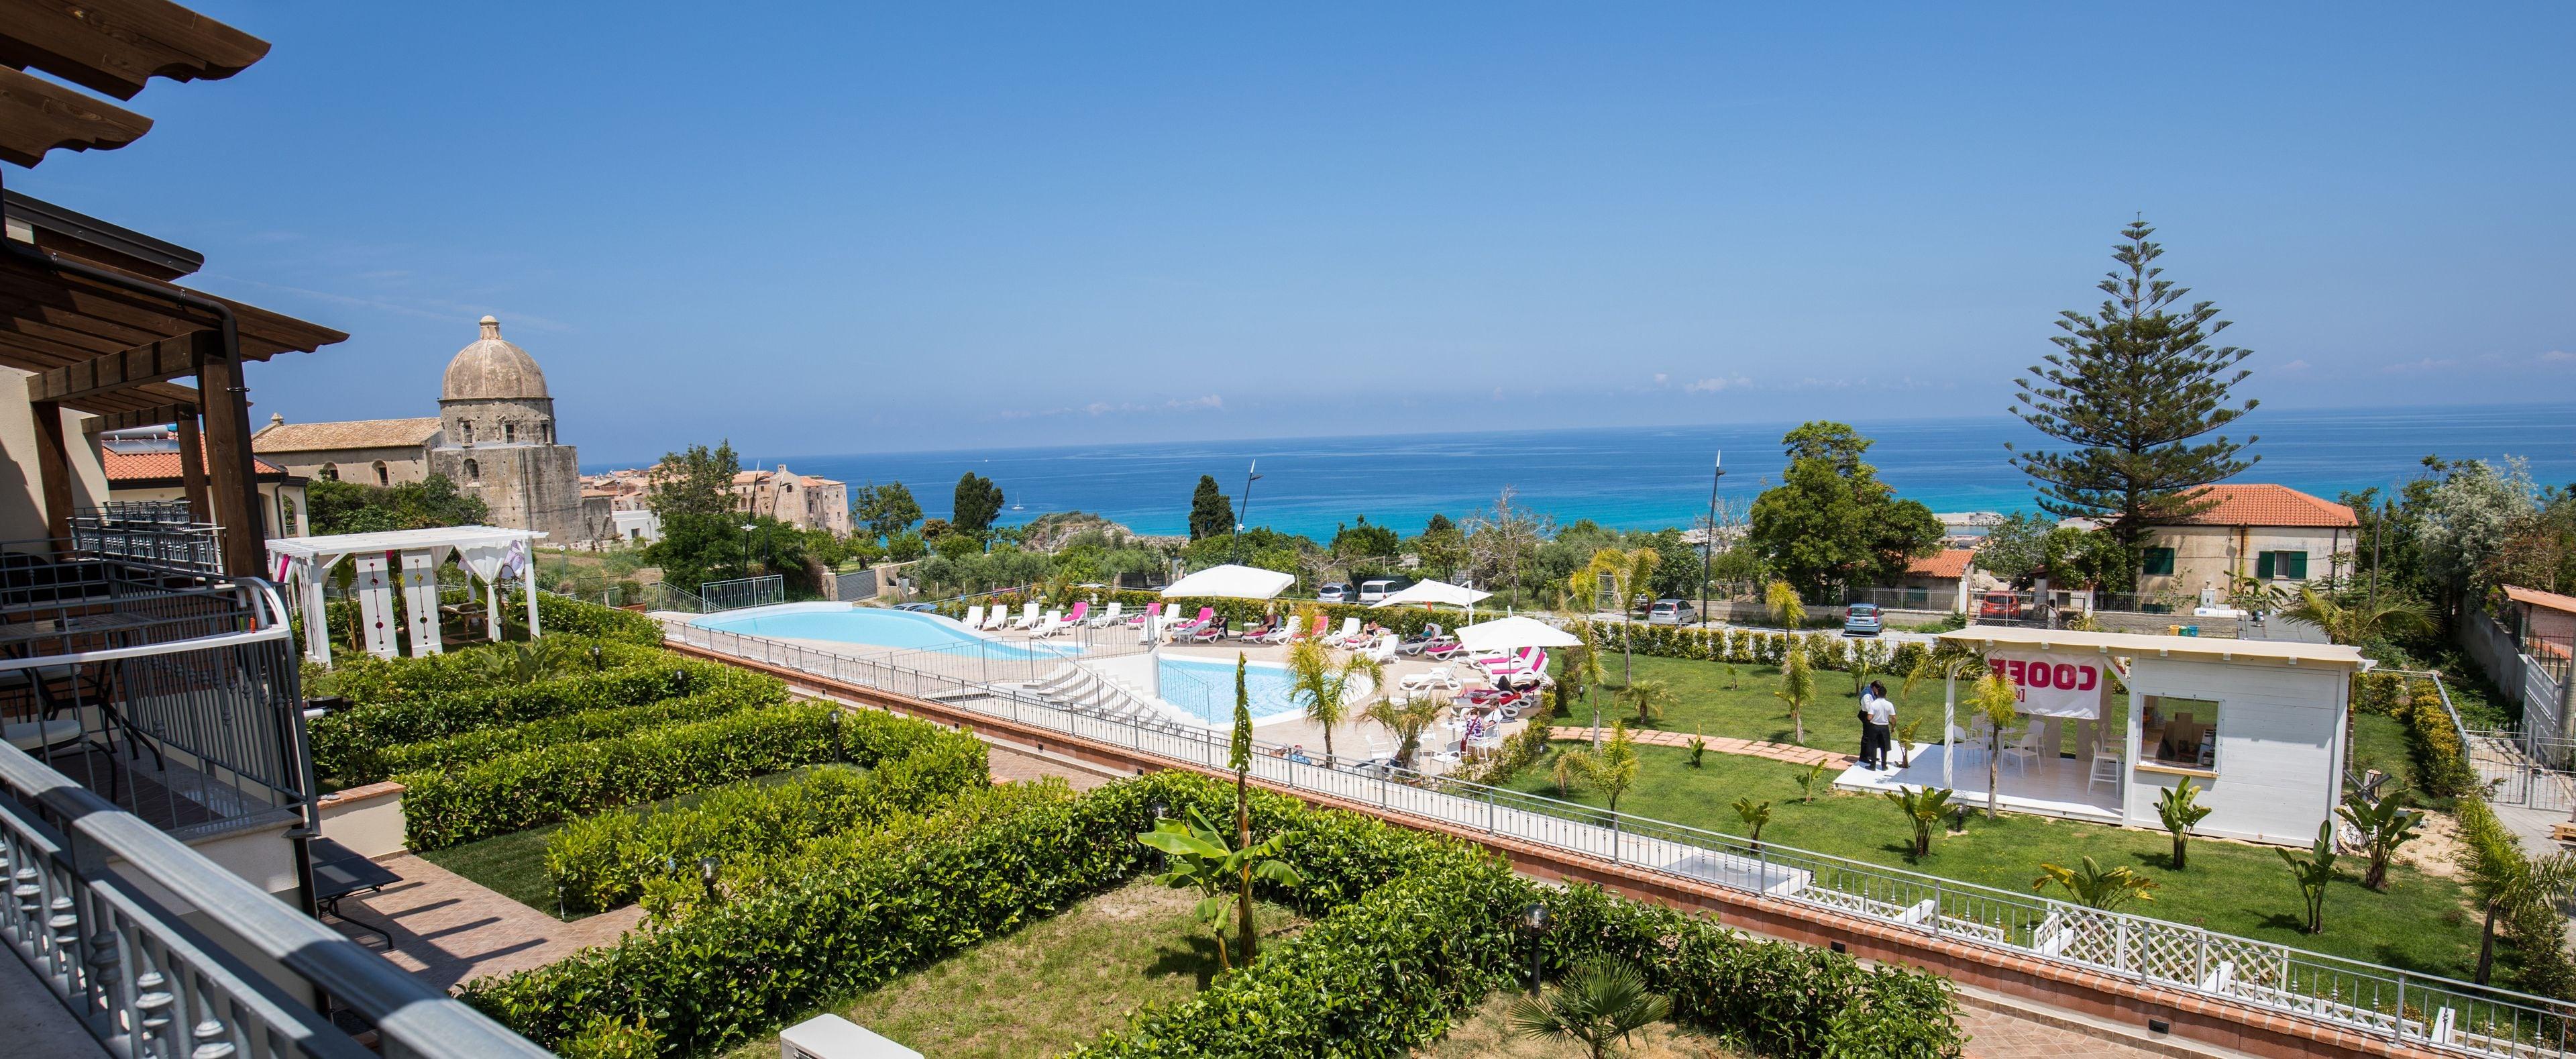 COOEE Michelizia Resort